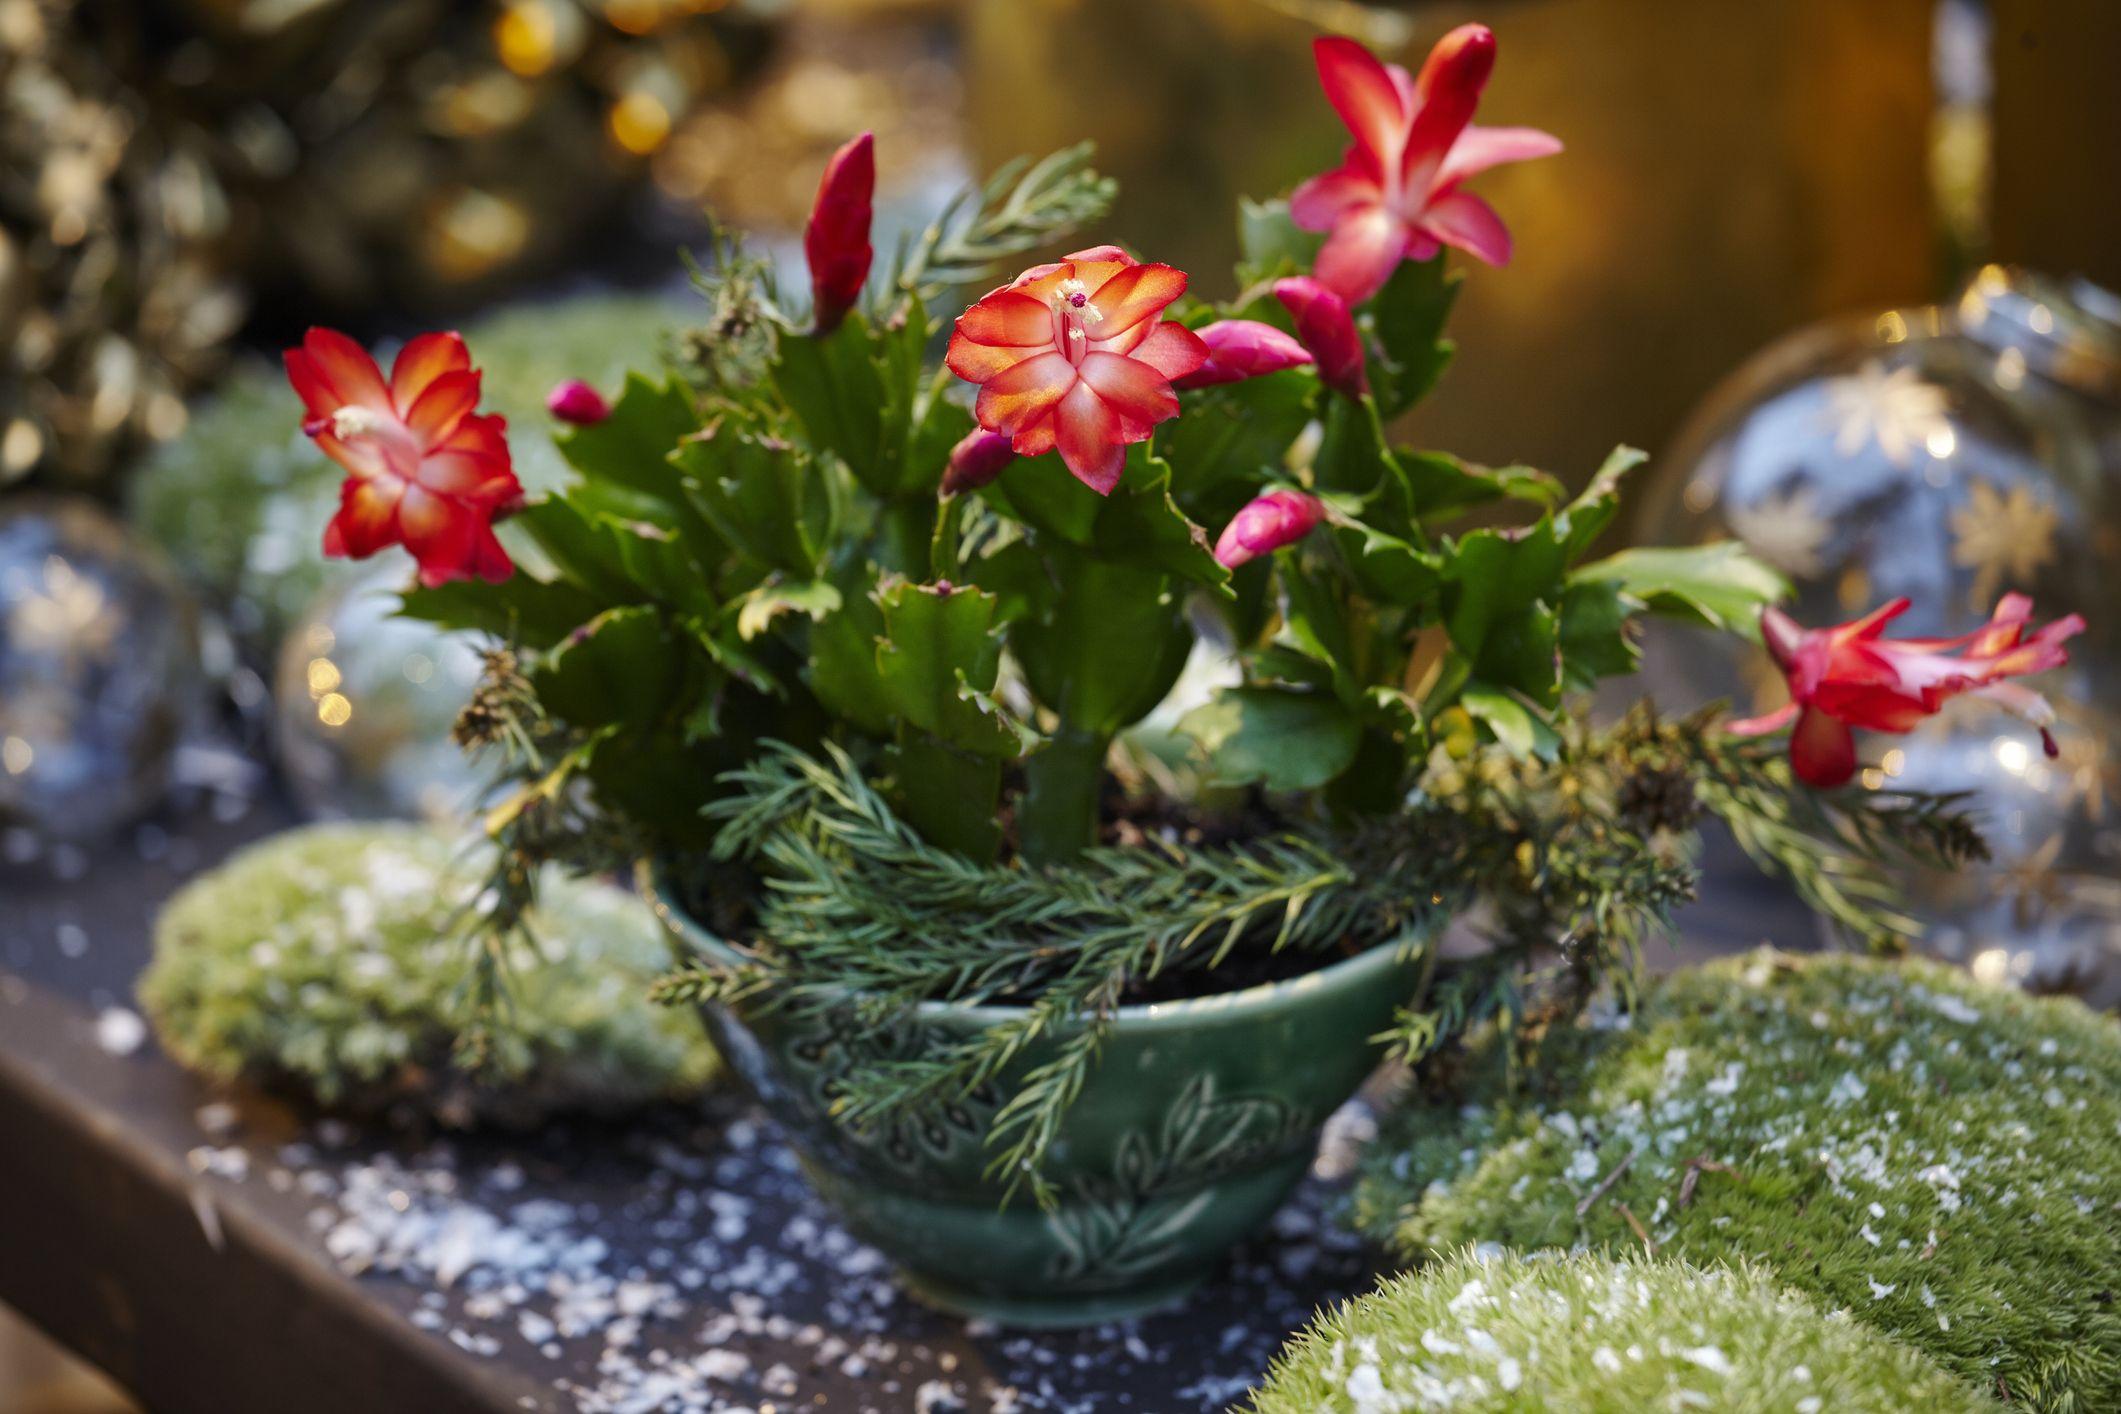 Christmas Cactus Care , How to Care for a Christmas Cactus Plant